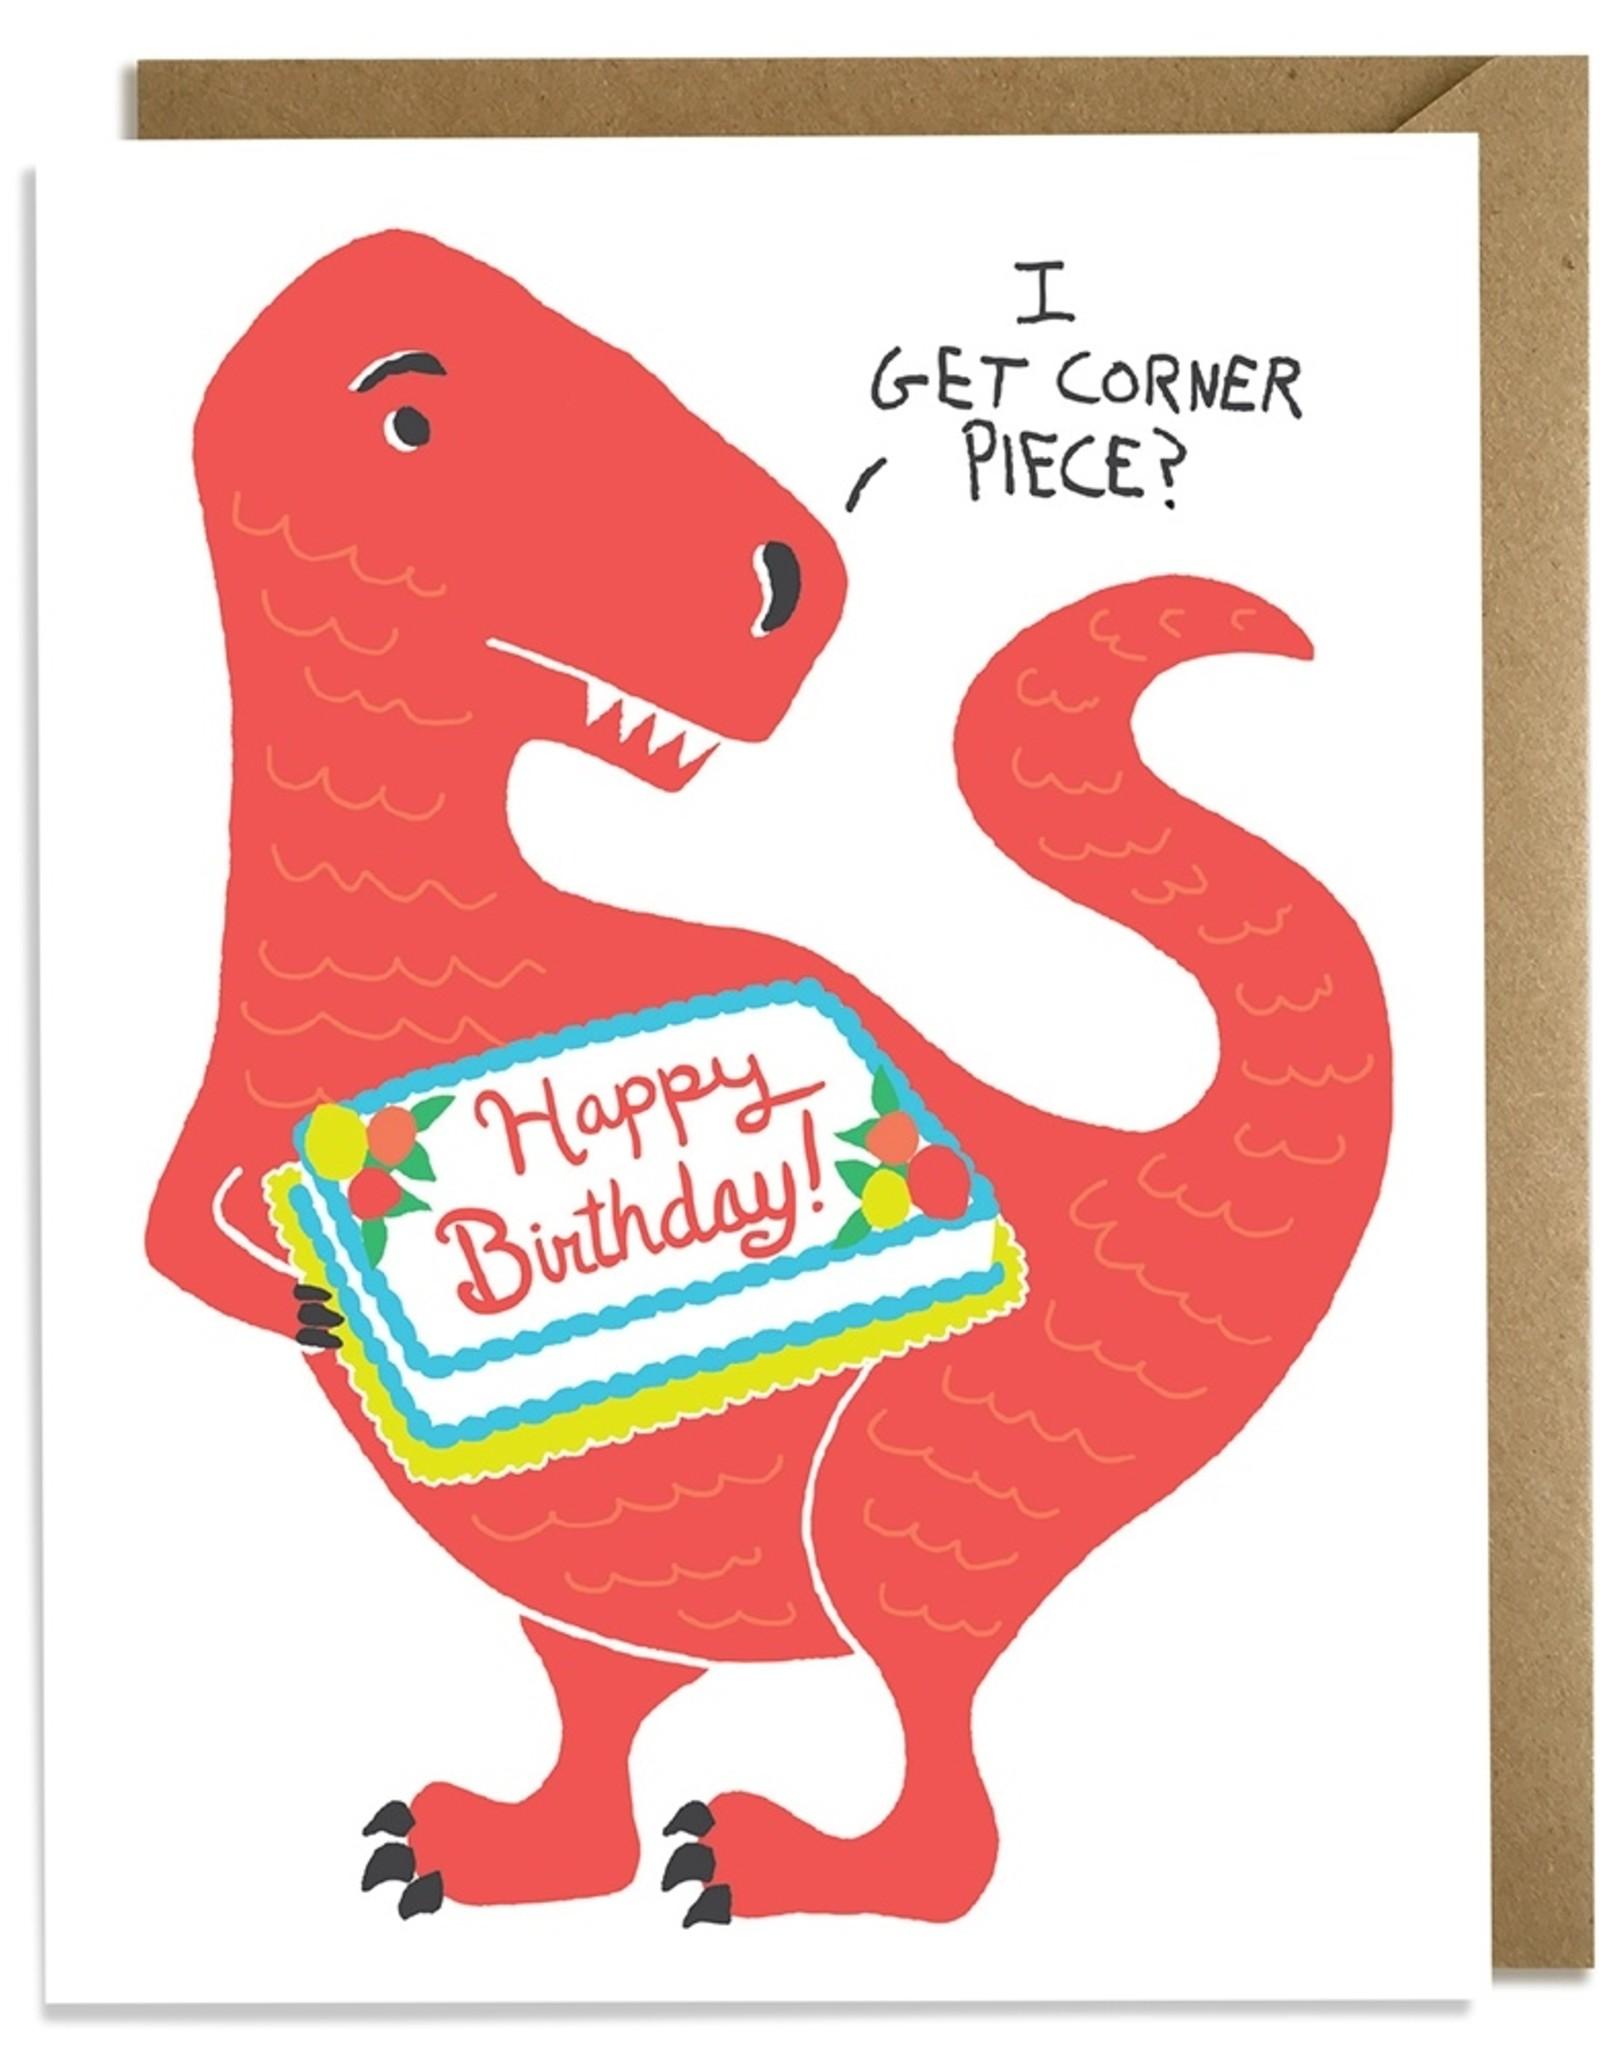 Kat French Card - Birthday: Corner Piece